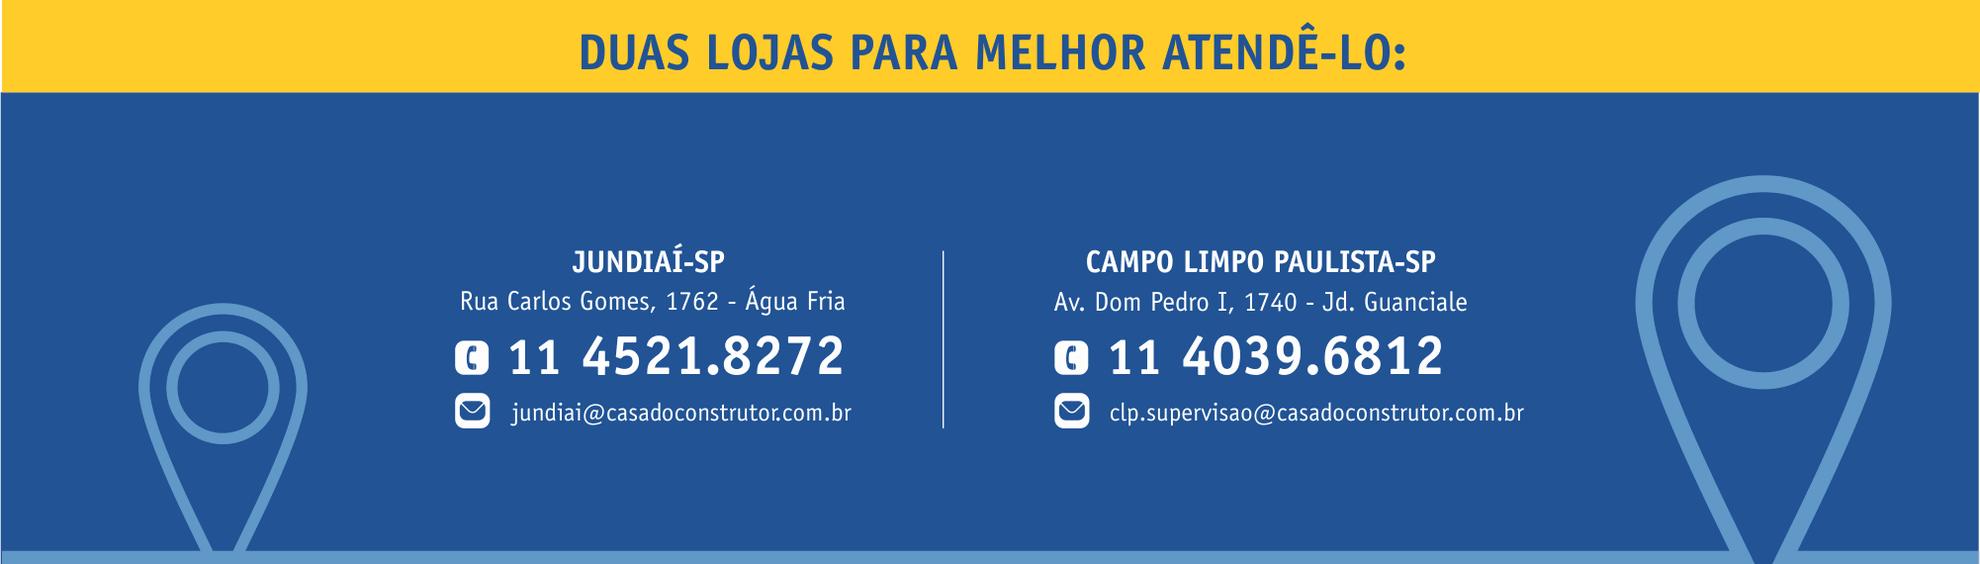 Casa do Construtor Campo Limpo Paulista